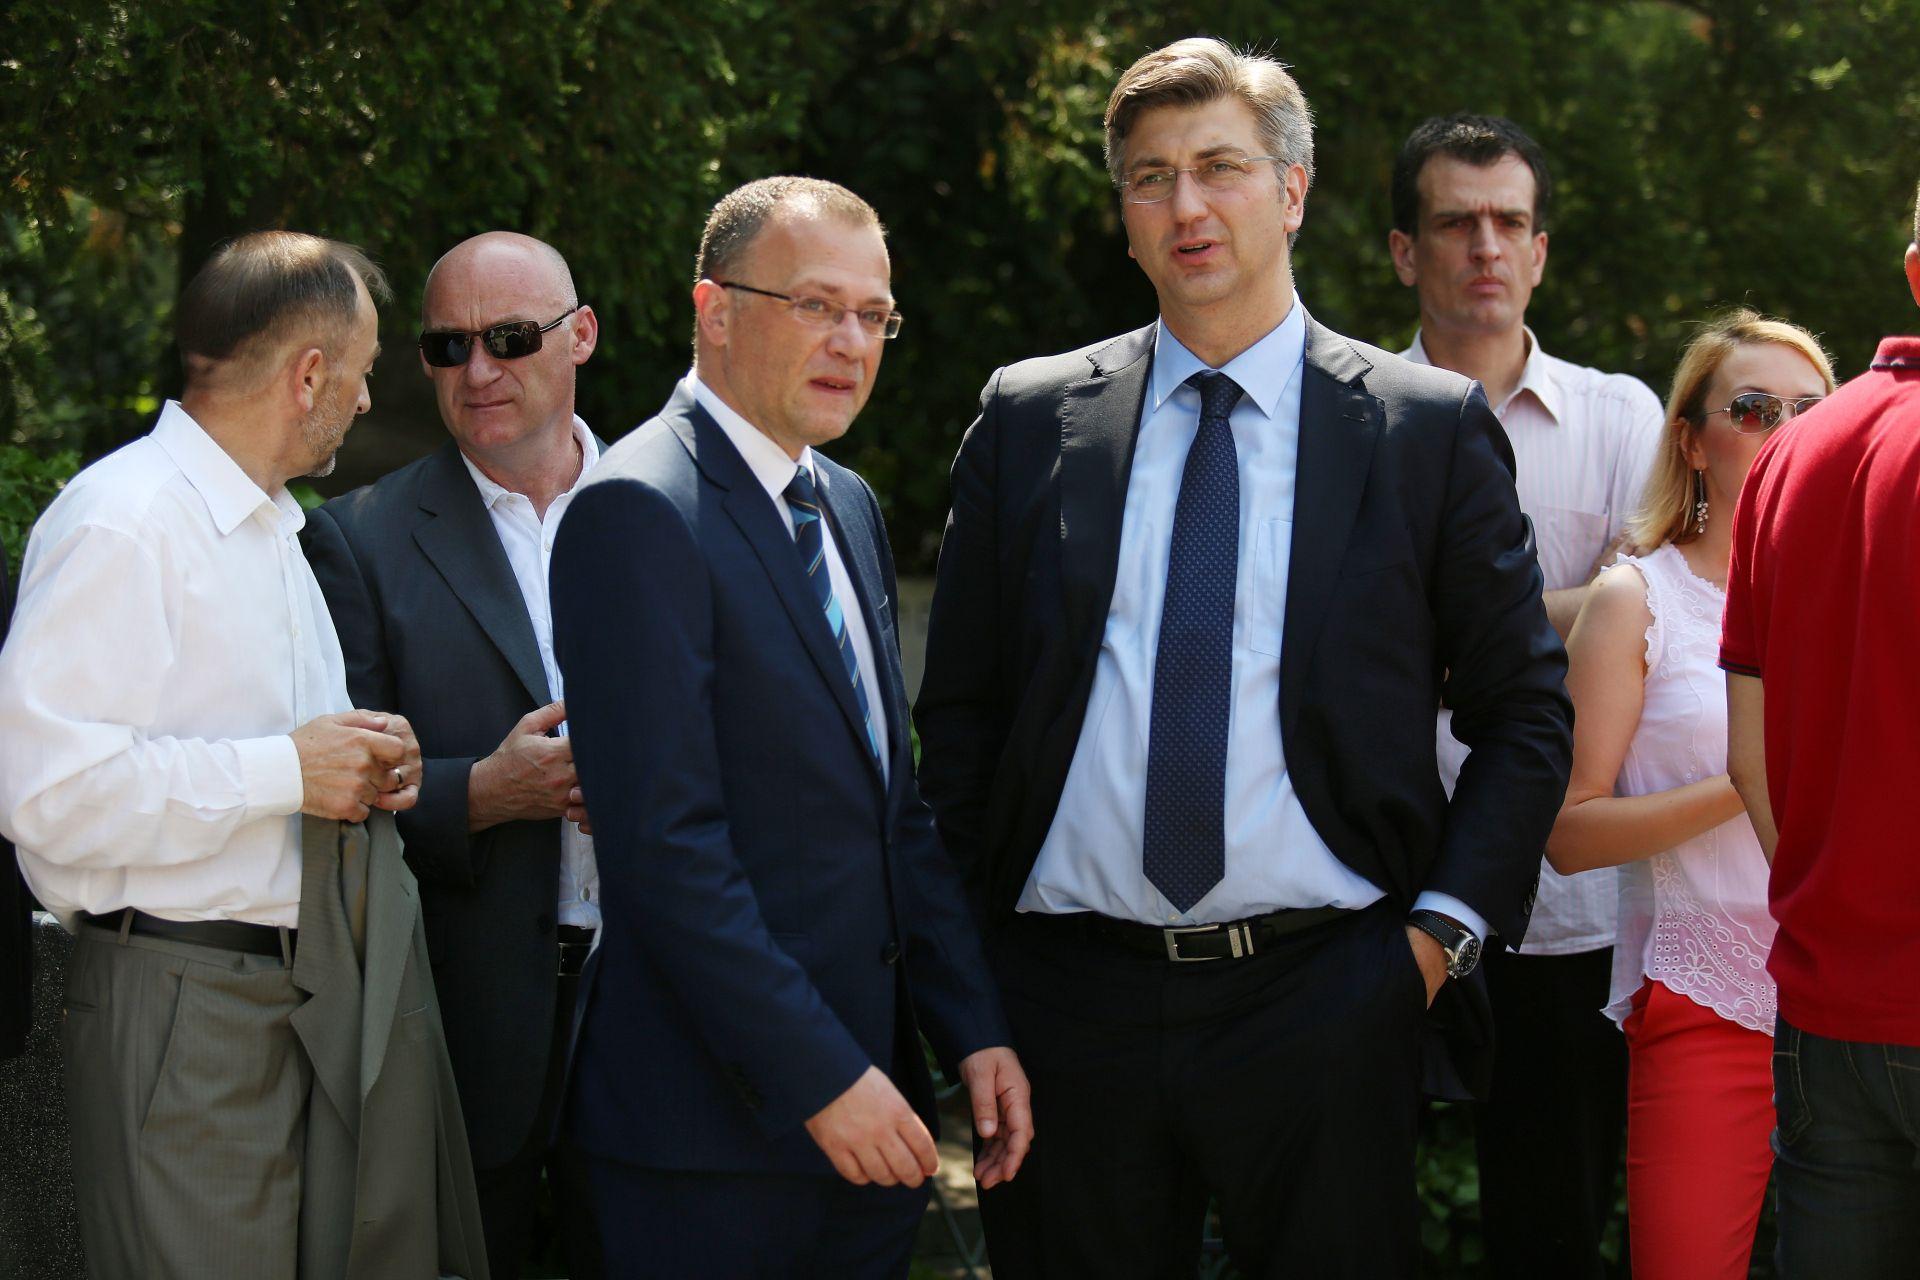 ANDREJ PLENKOVIĆ: 'Želim staviti fokus na to da Hrvatska bude politički stabilna zemlja'